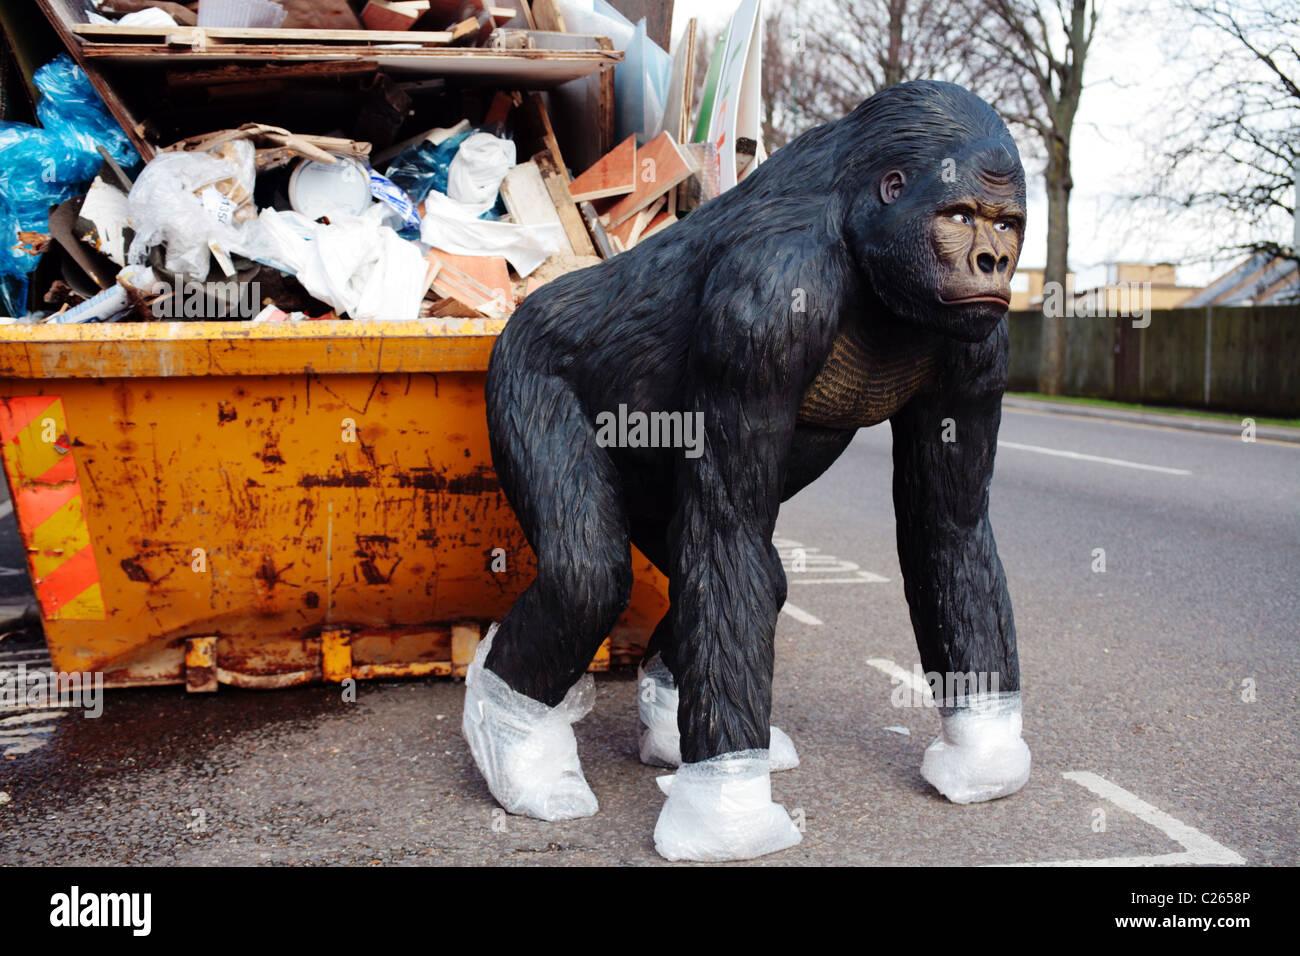 gorilla at bin - Stock Image